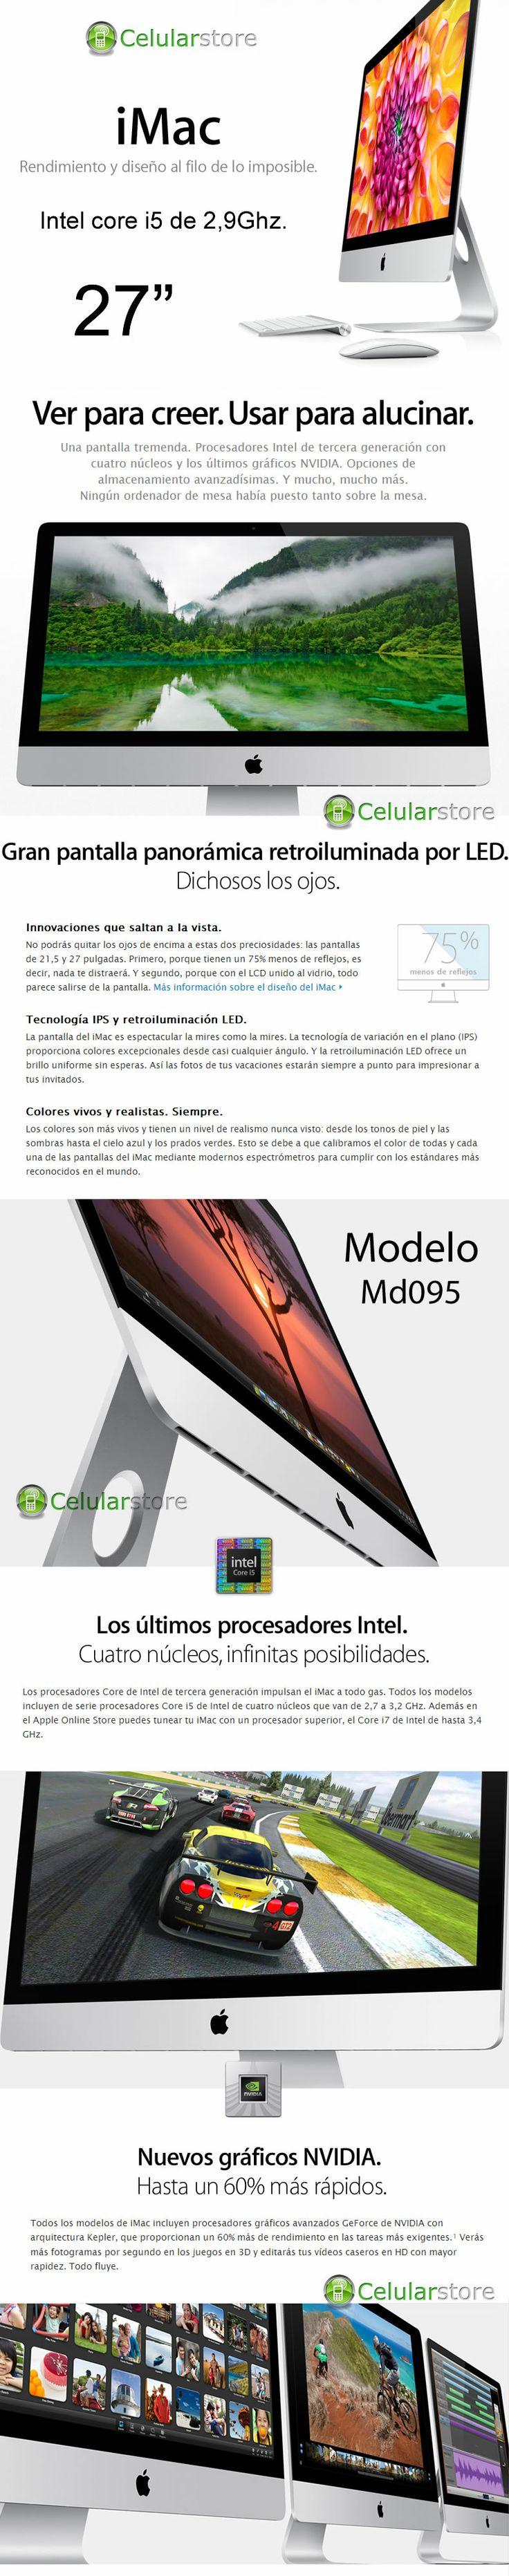 Comprar apple imac md095 | venta de apple imac md095 Argentina